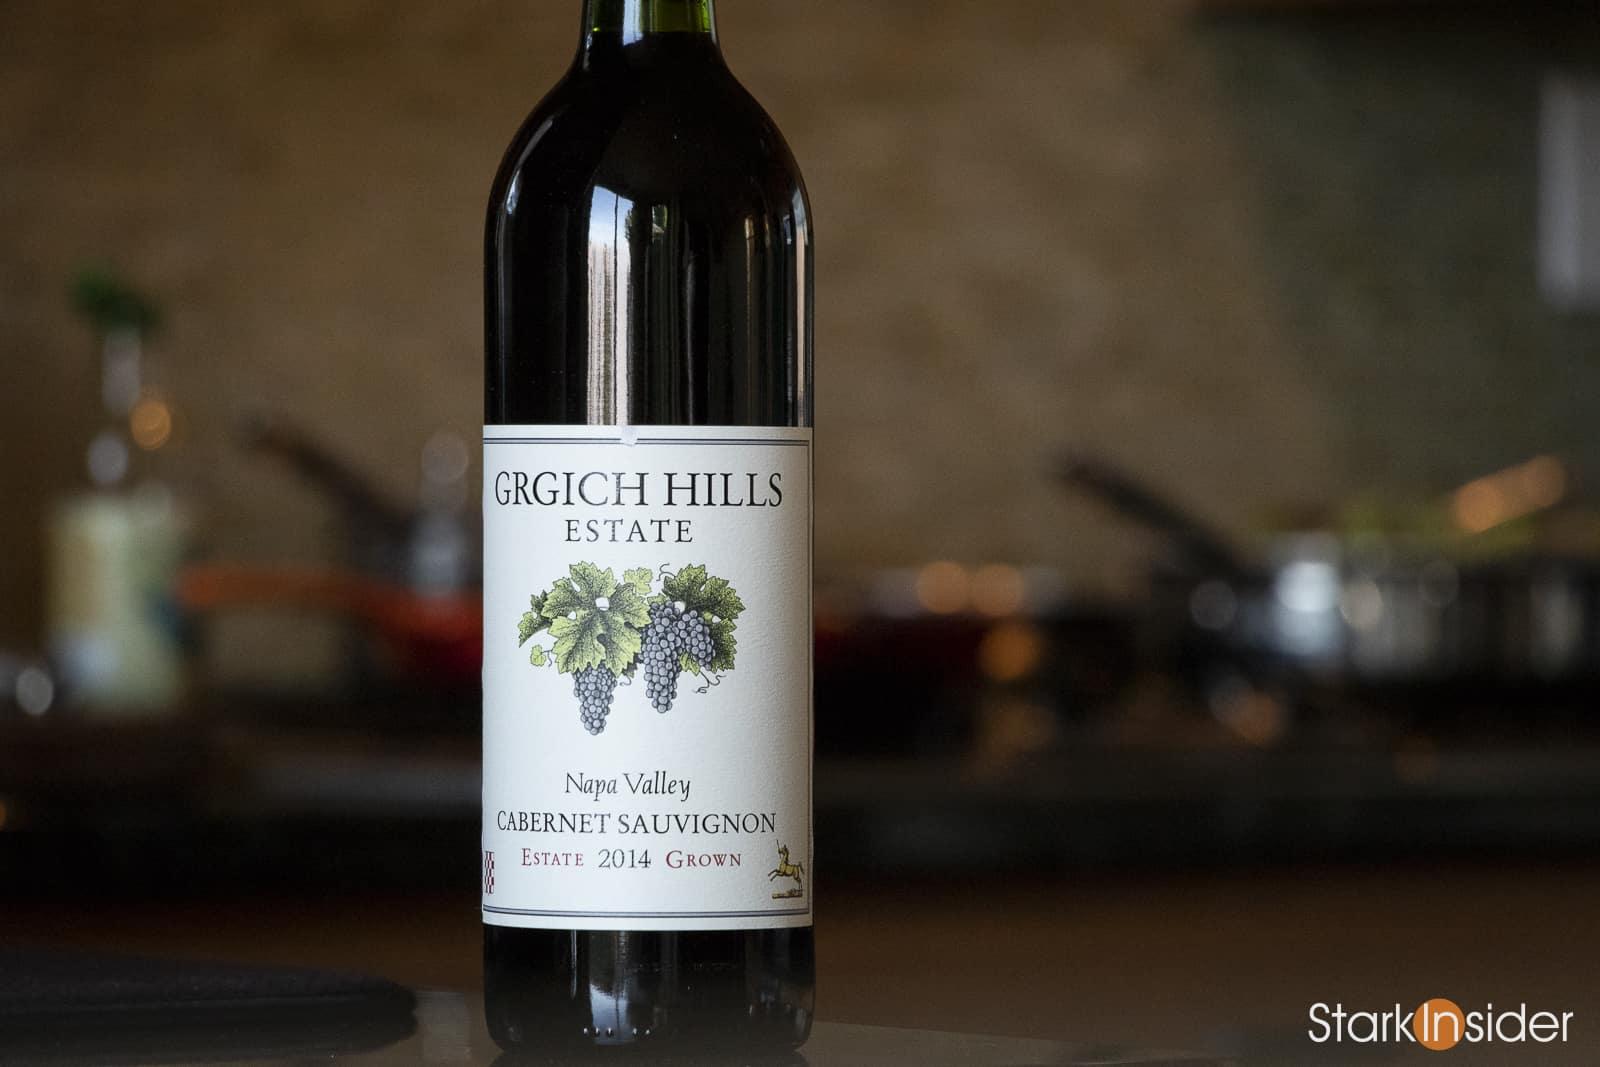 Wine Review: Grgich Hills 2014 Cabernet Sauvignon Napa Valley